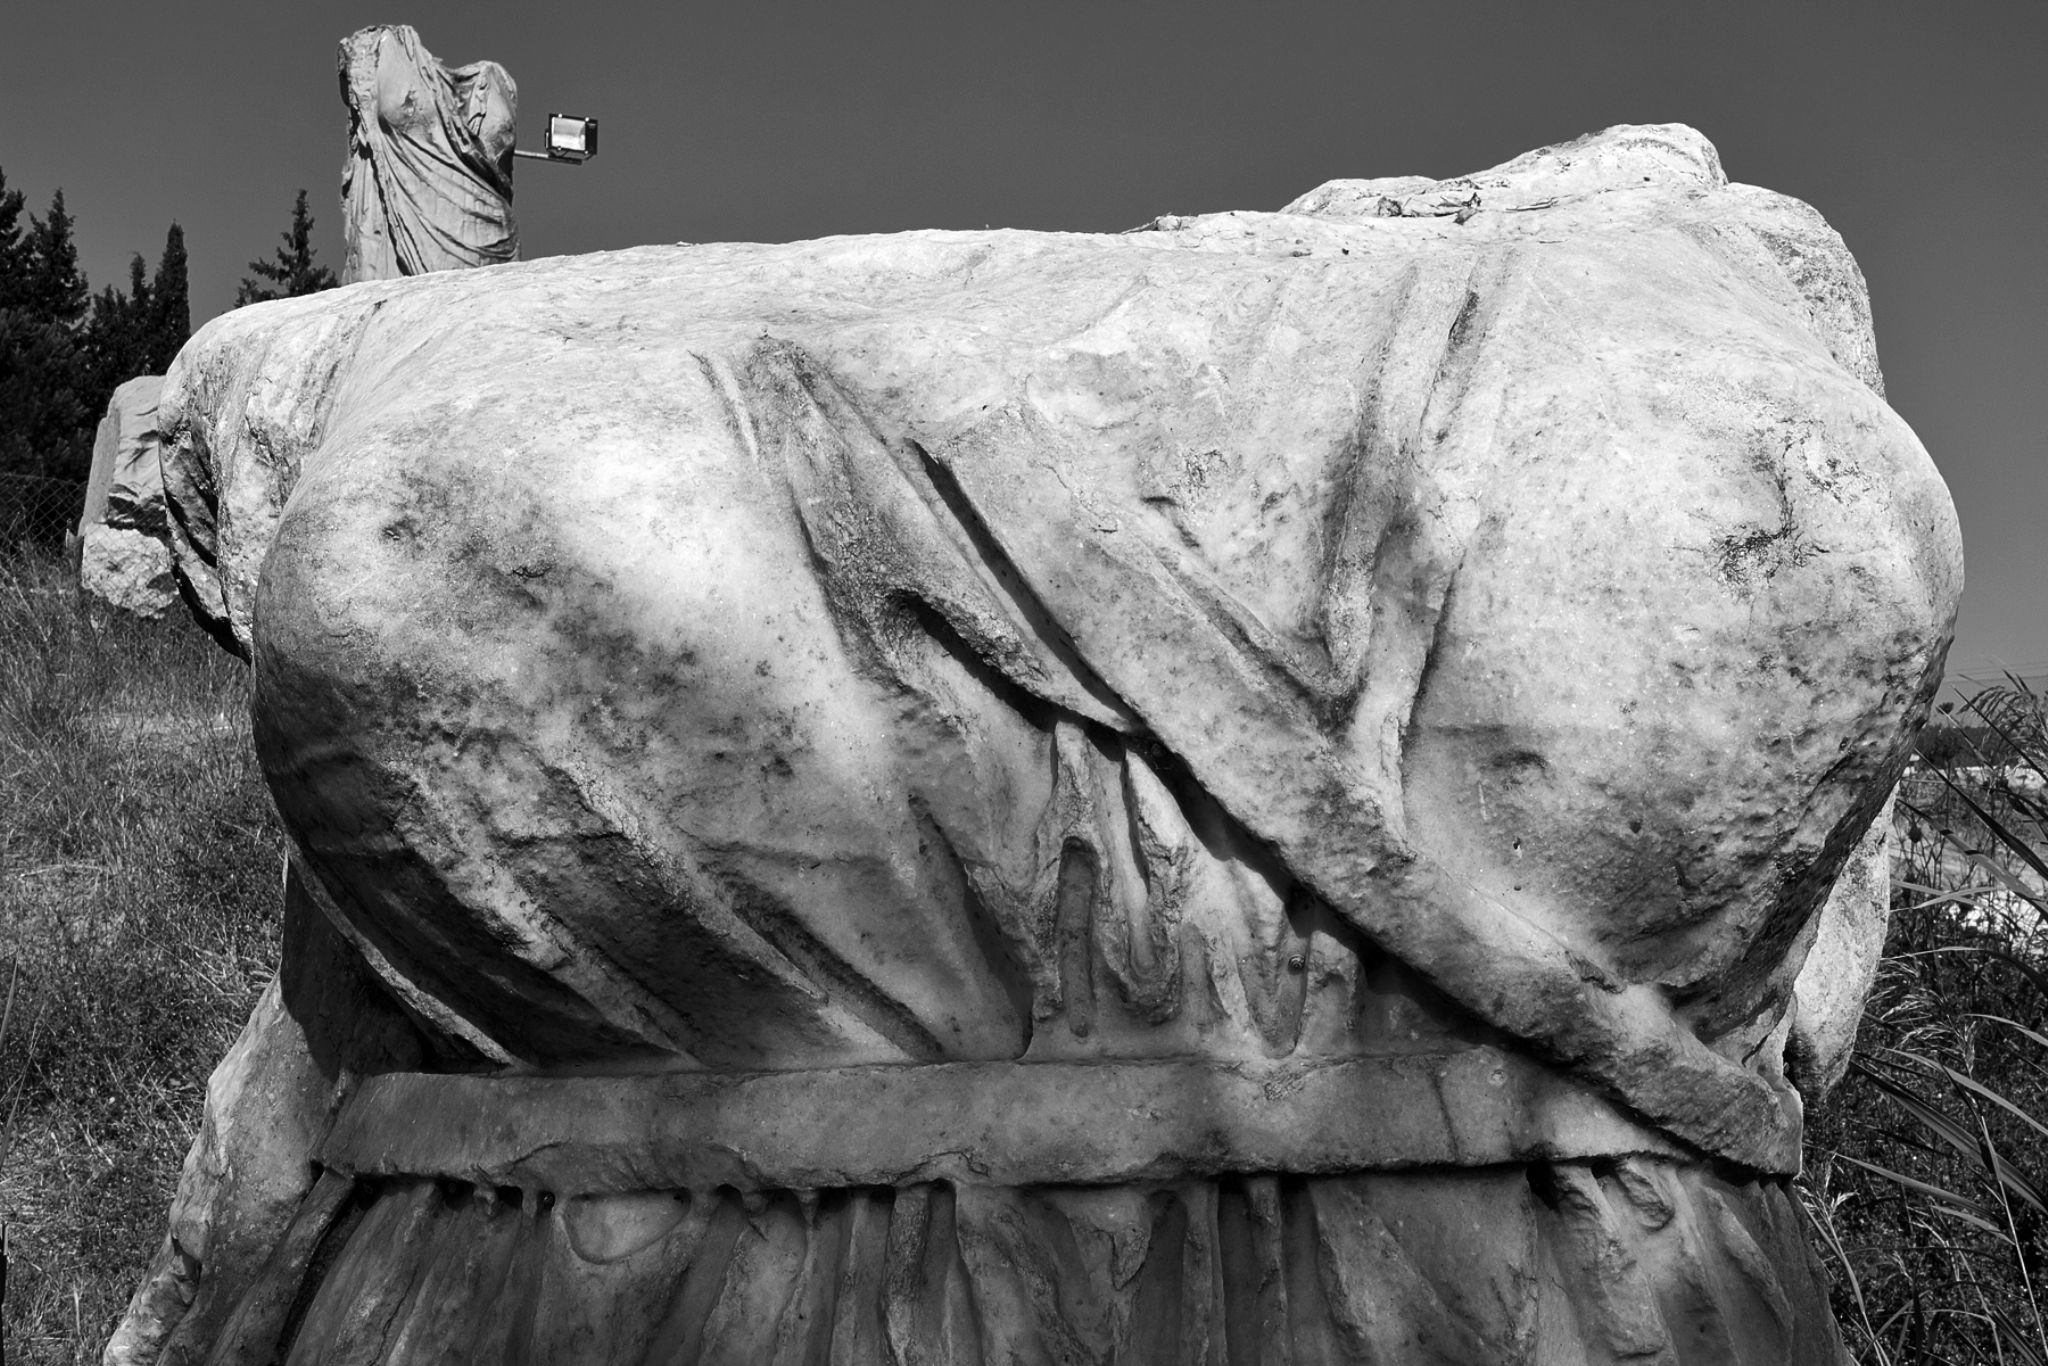 Kafasız Vücutlar ( Headless Bodies ) by Suleyman Bilgen